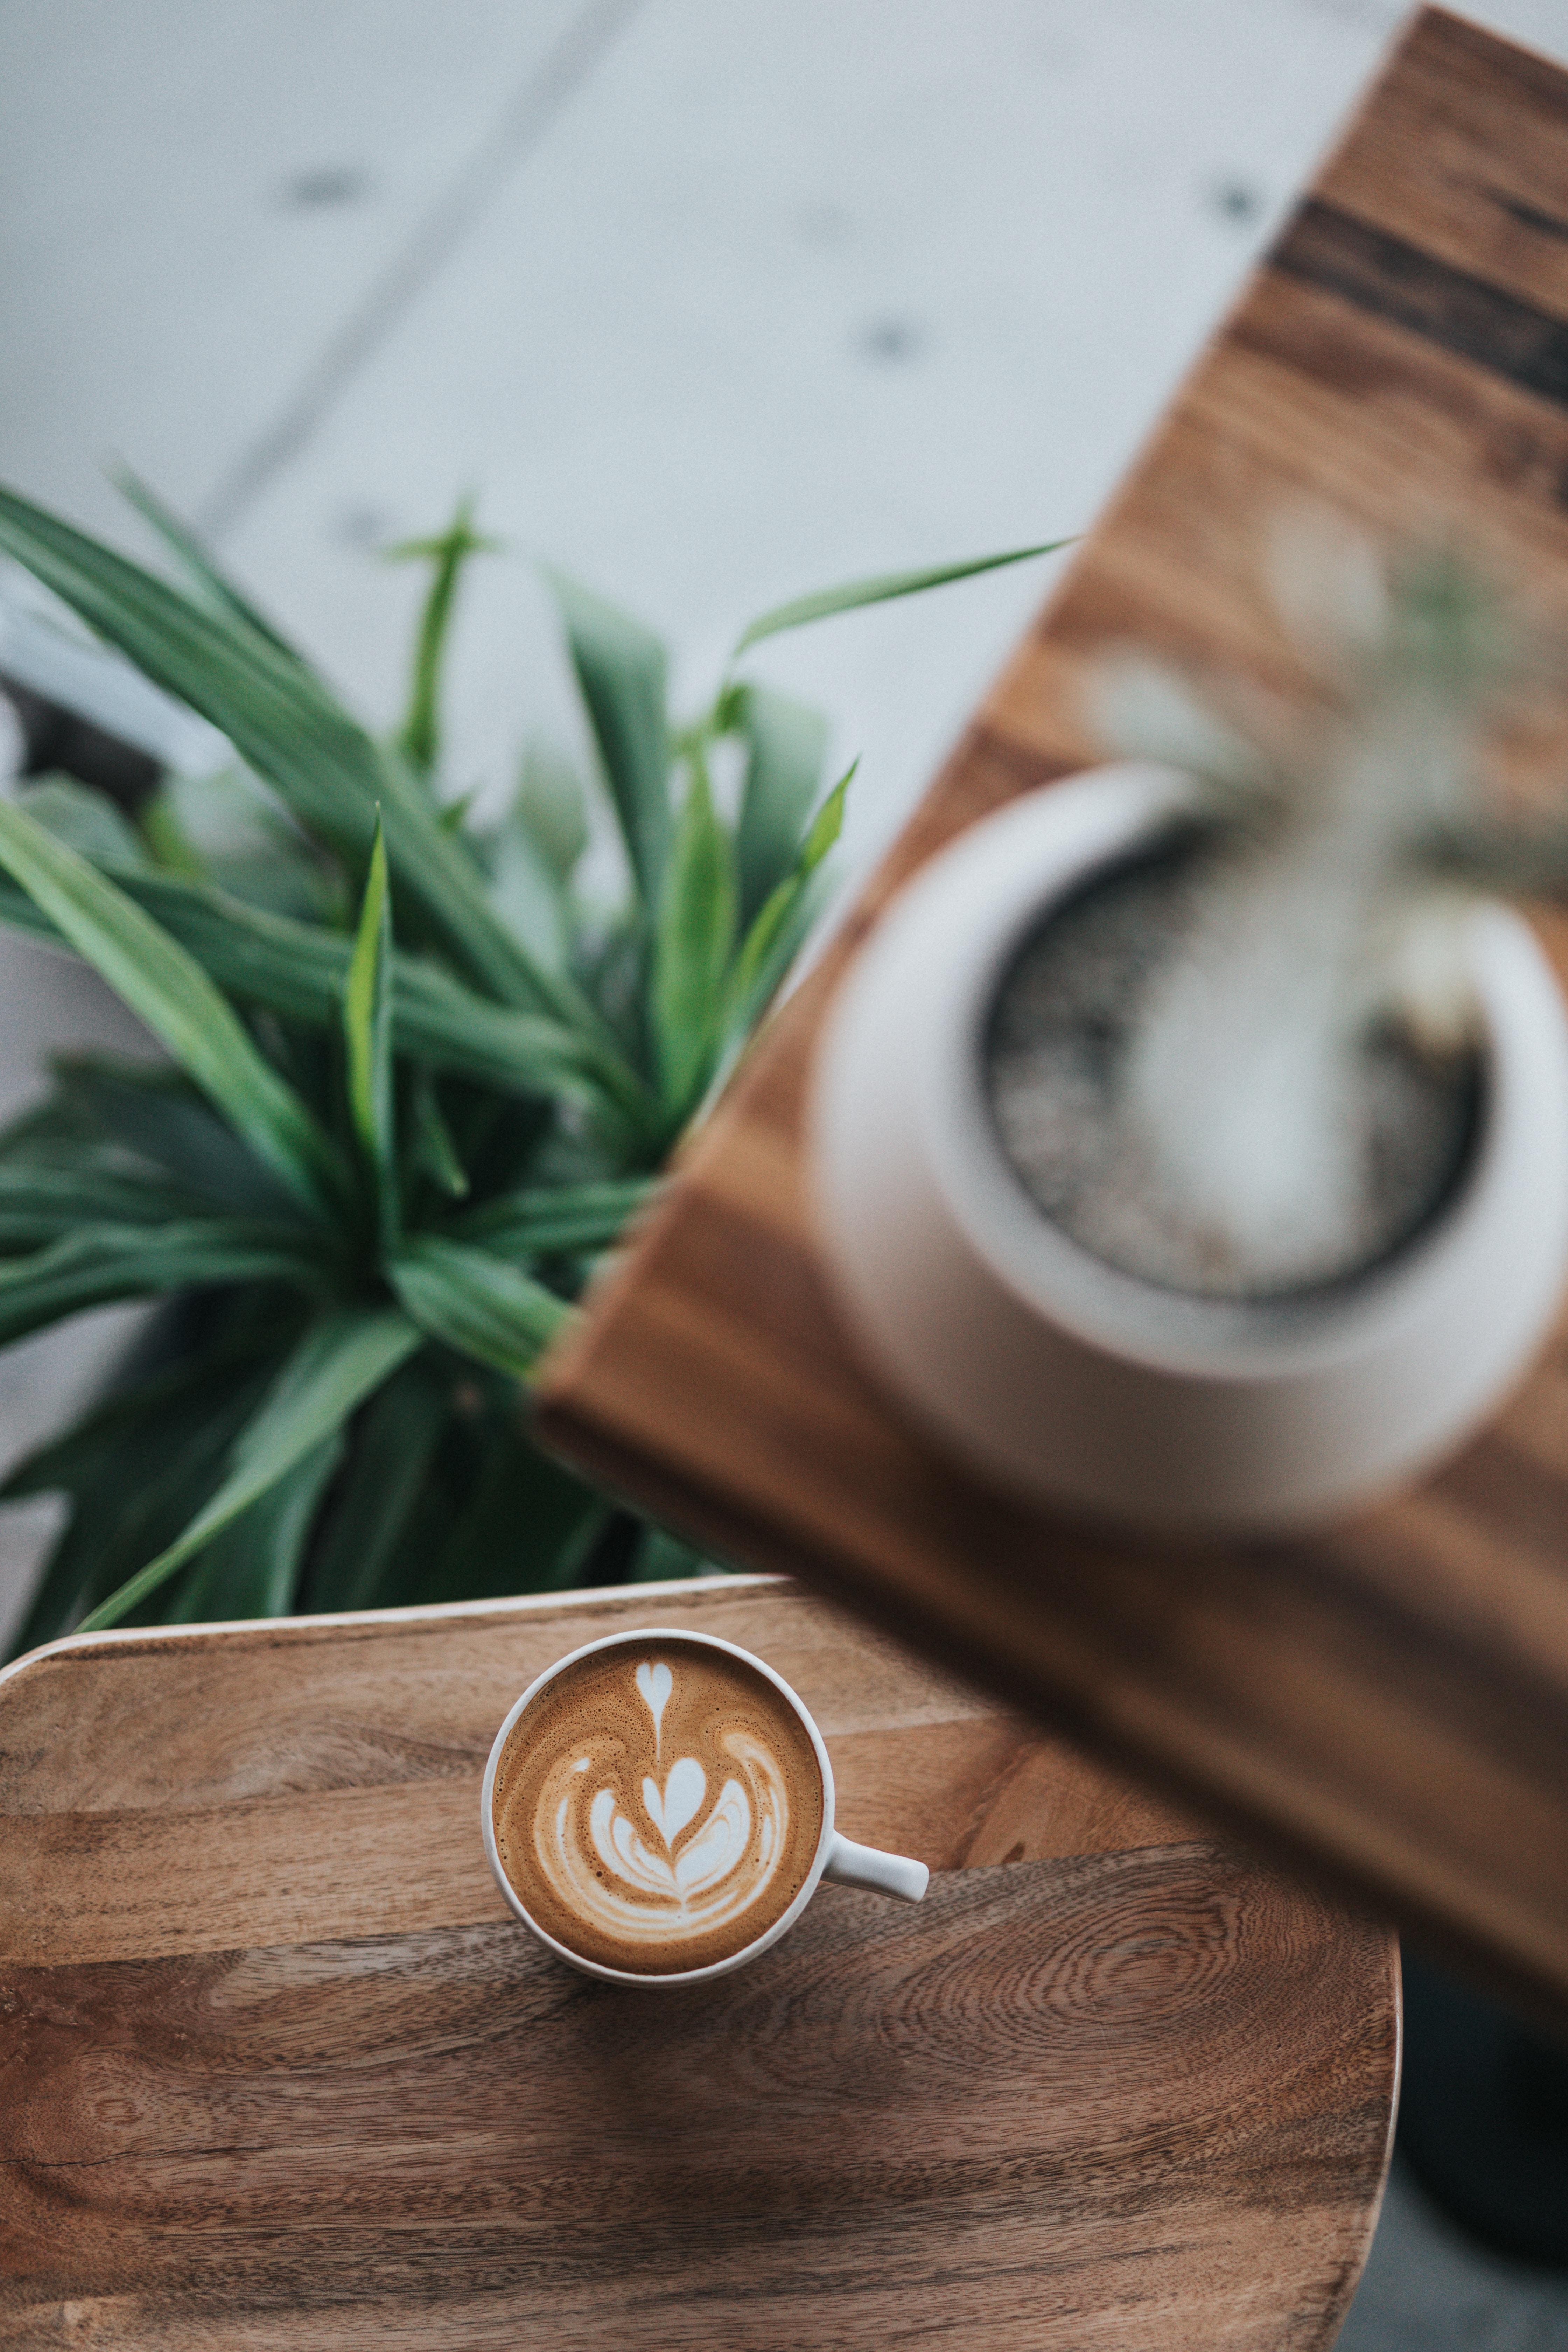 white ceramic teacup on brown wooden desk